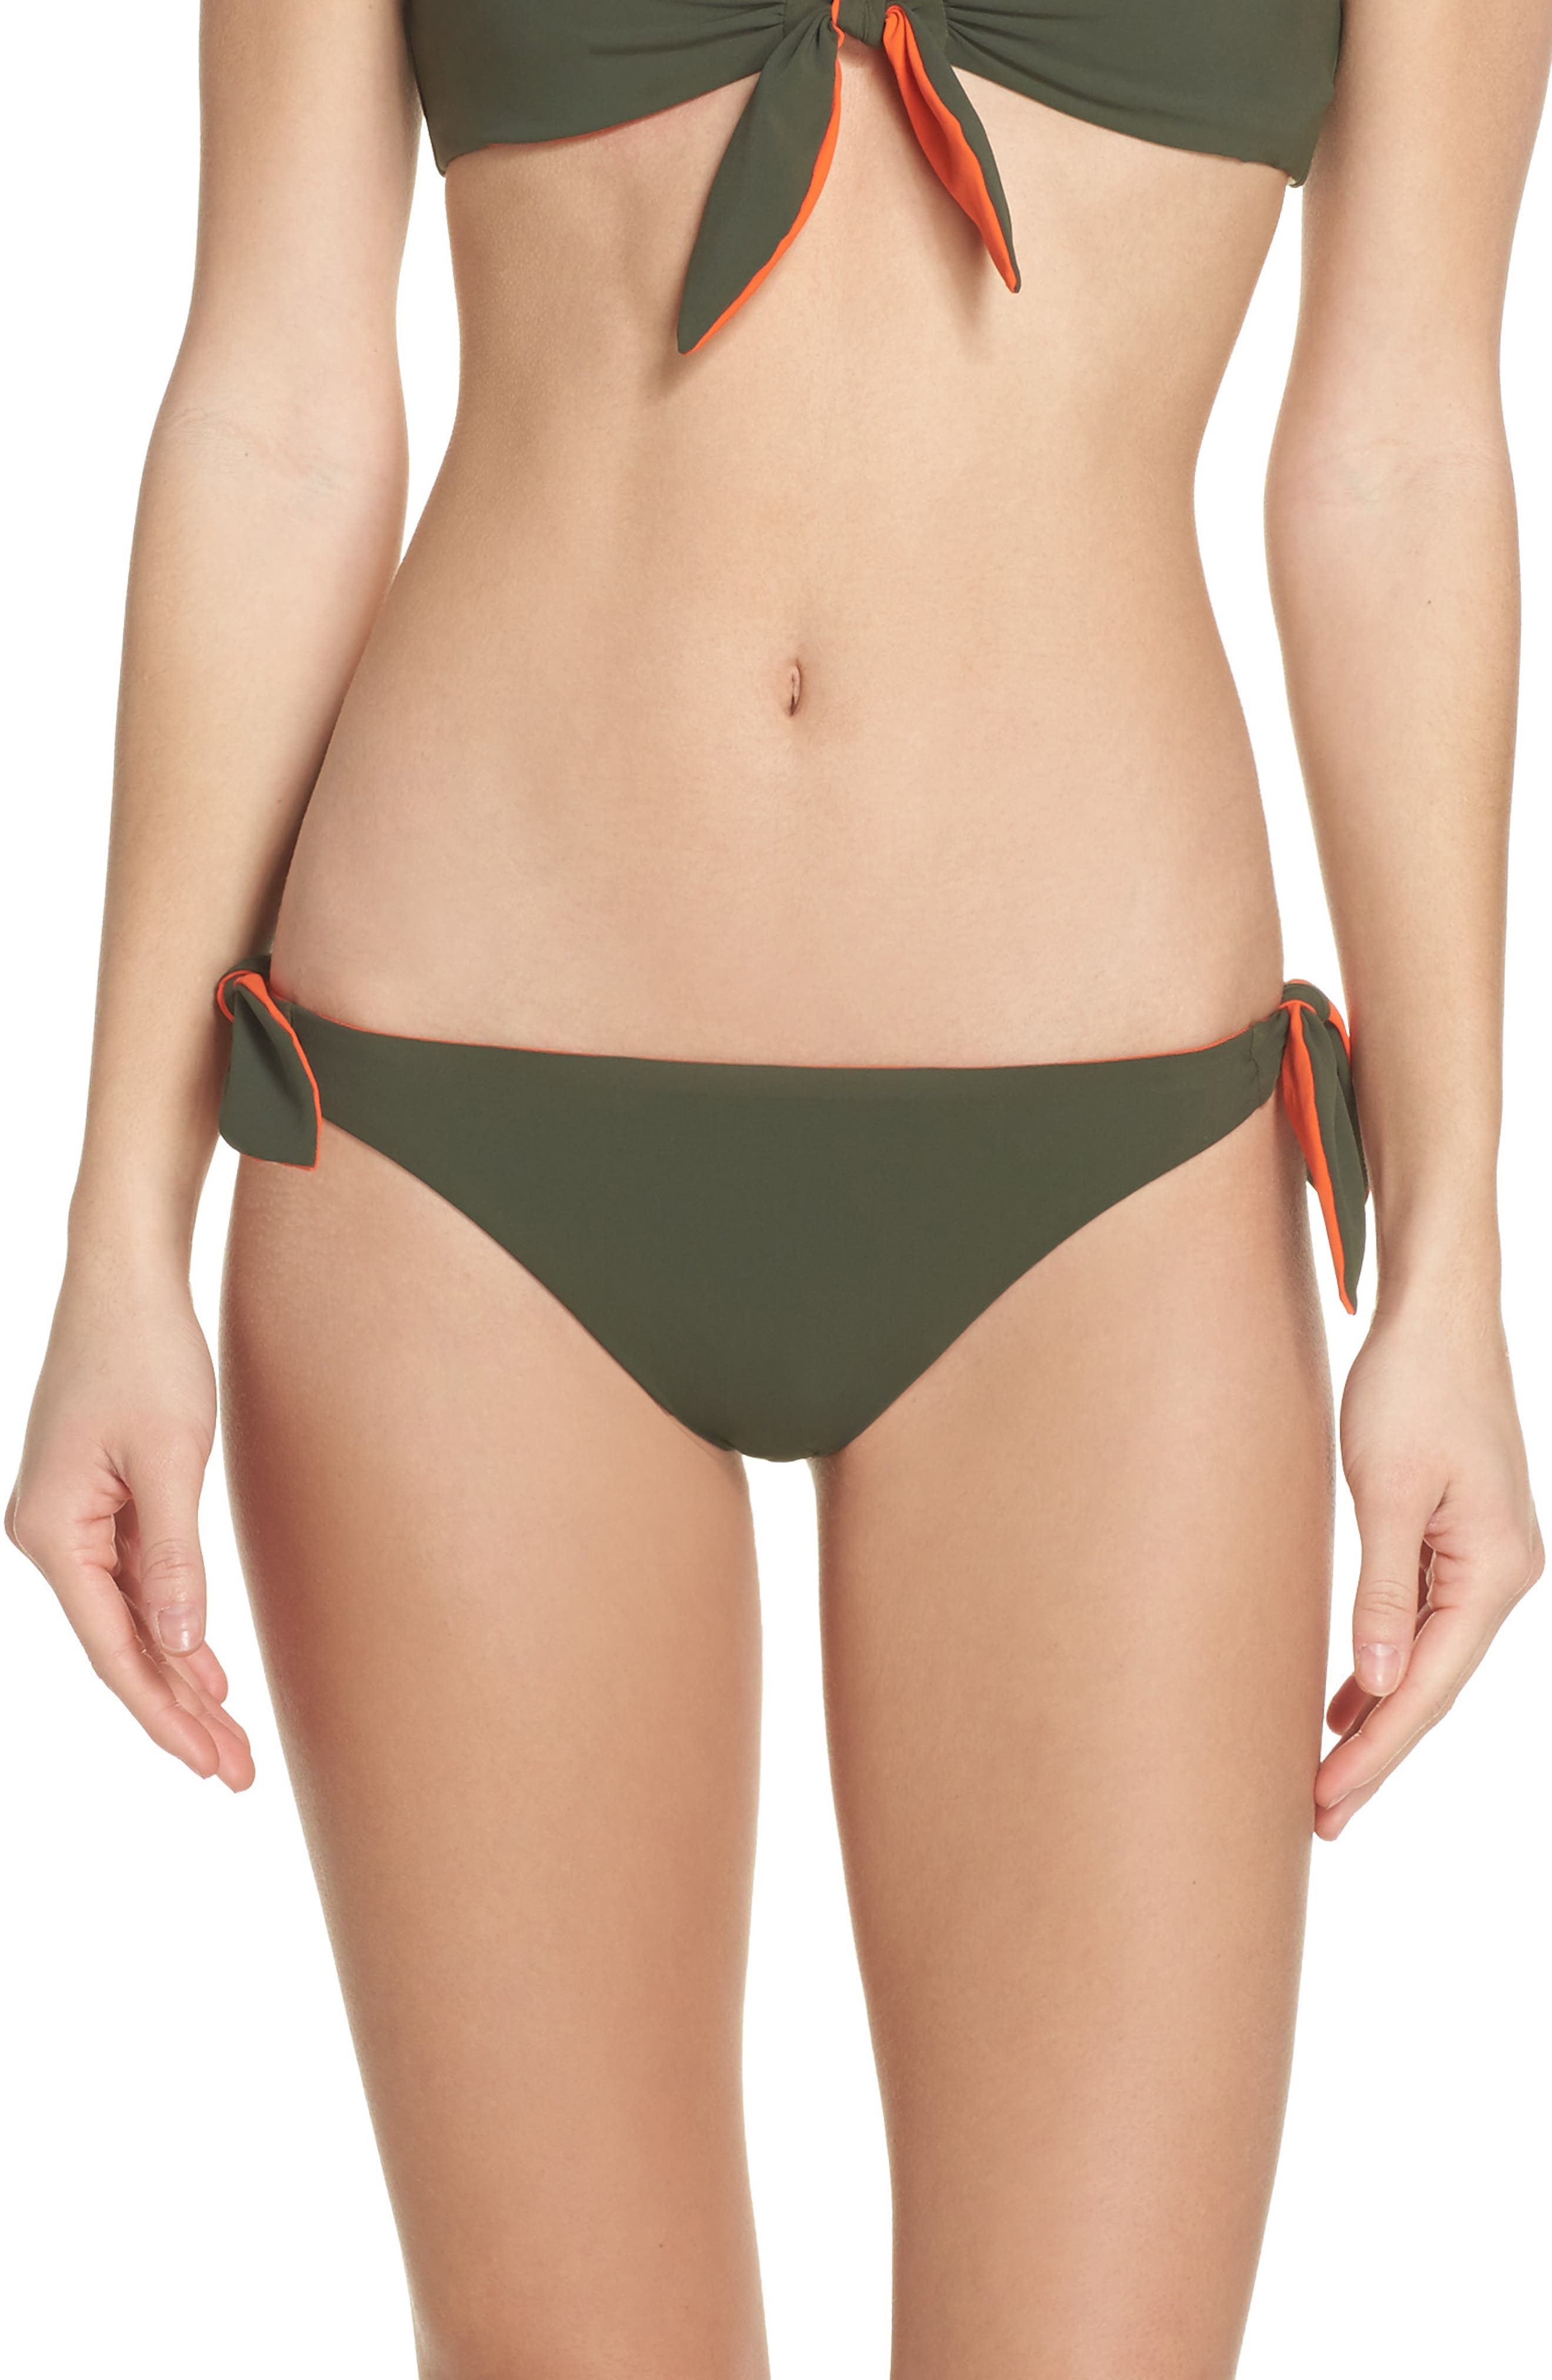 Biarritz Reversible Bikini Bottoms,                         Main,                         color, Green Olive/ Sweet Tangerine